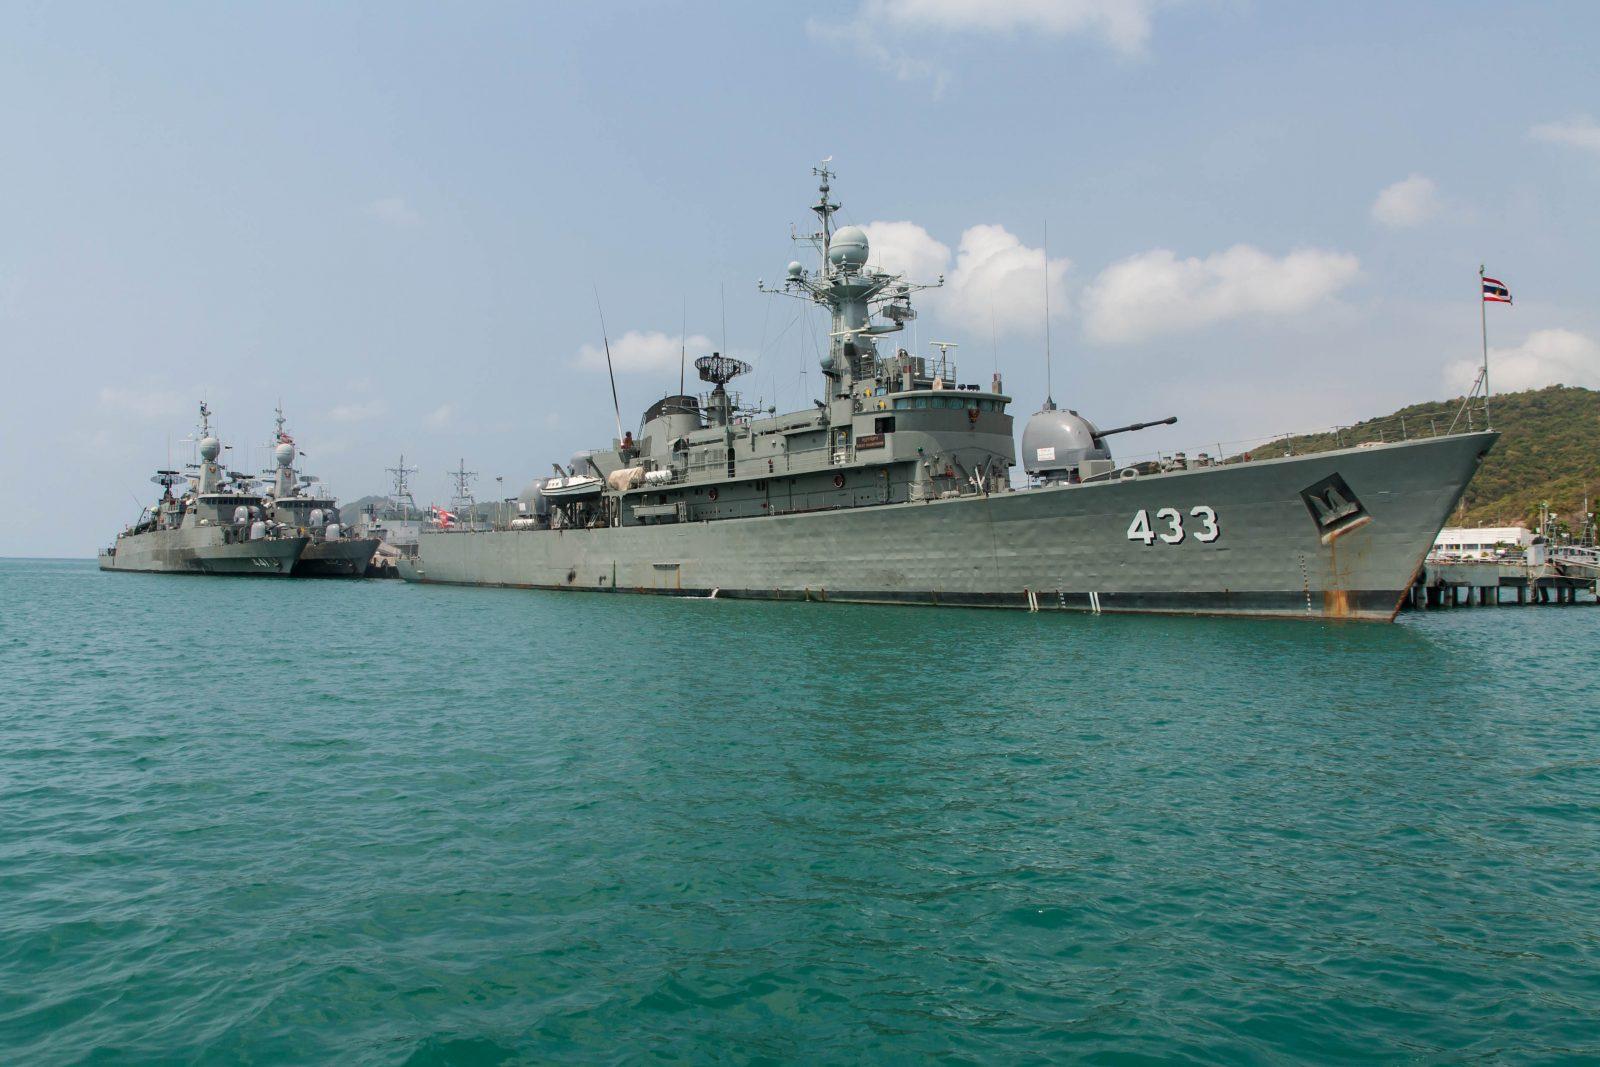 Warship stock photo by PATBOON